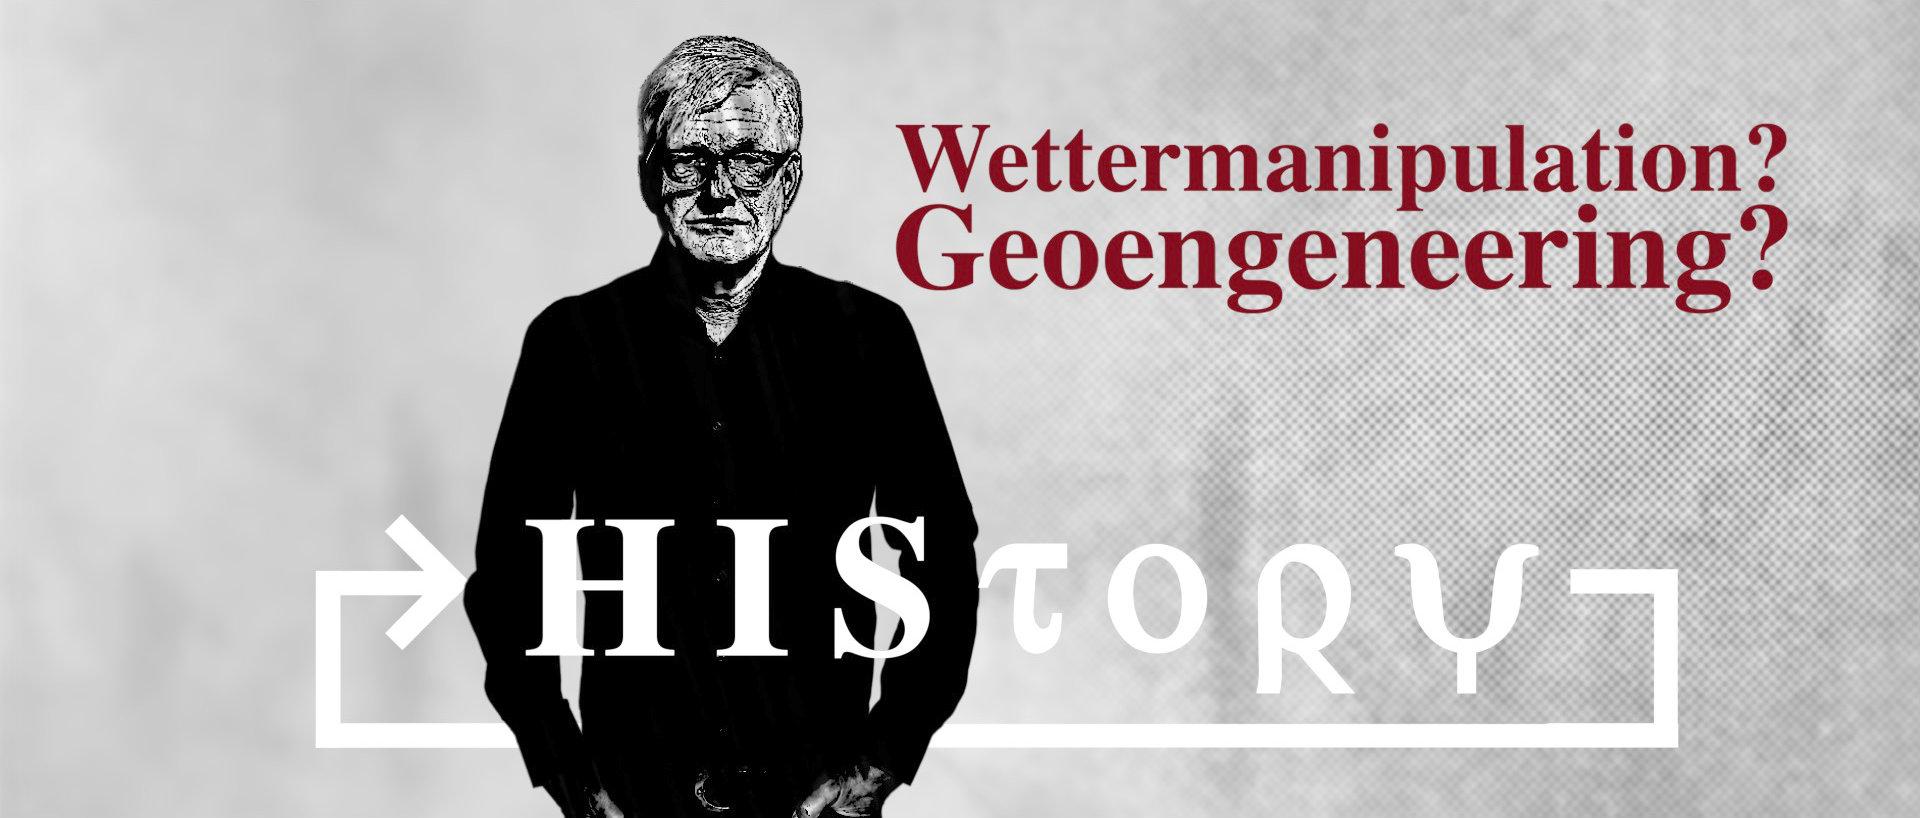 history:-wettermanipulation?-geoengineering?-gibt-es-schon-lange- -kenfm.de